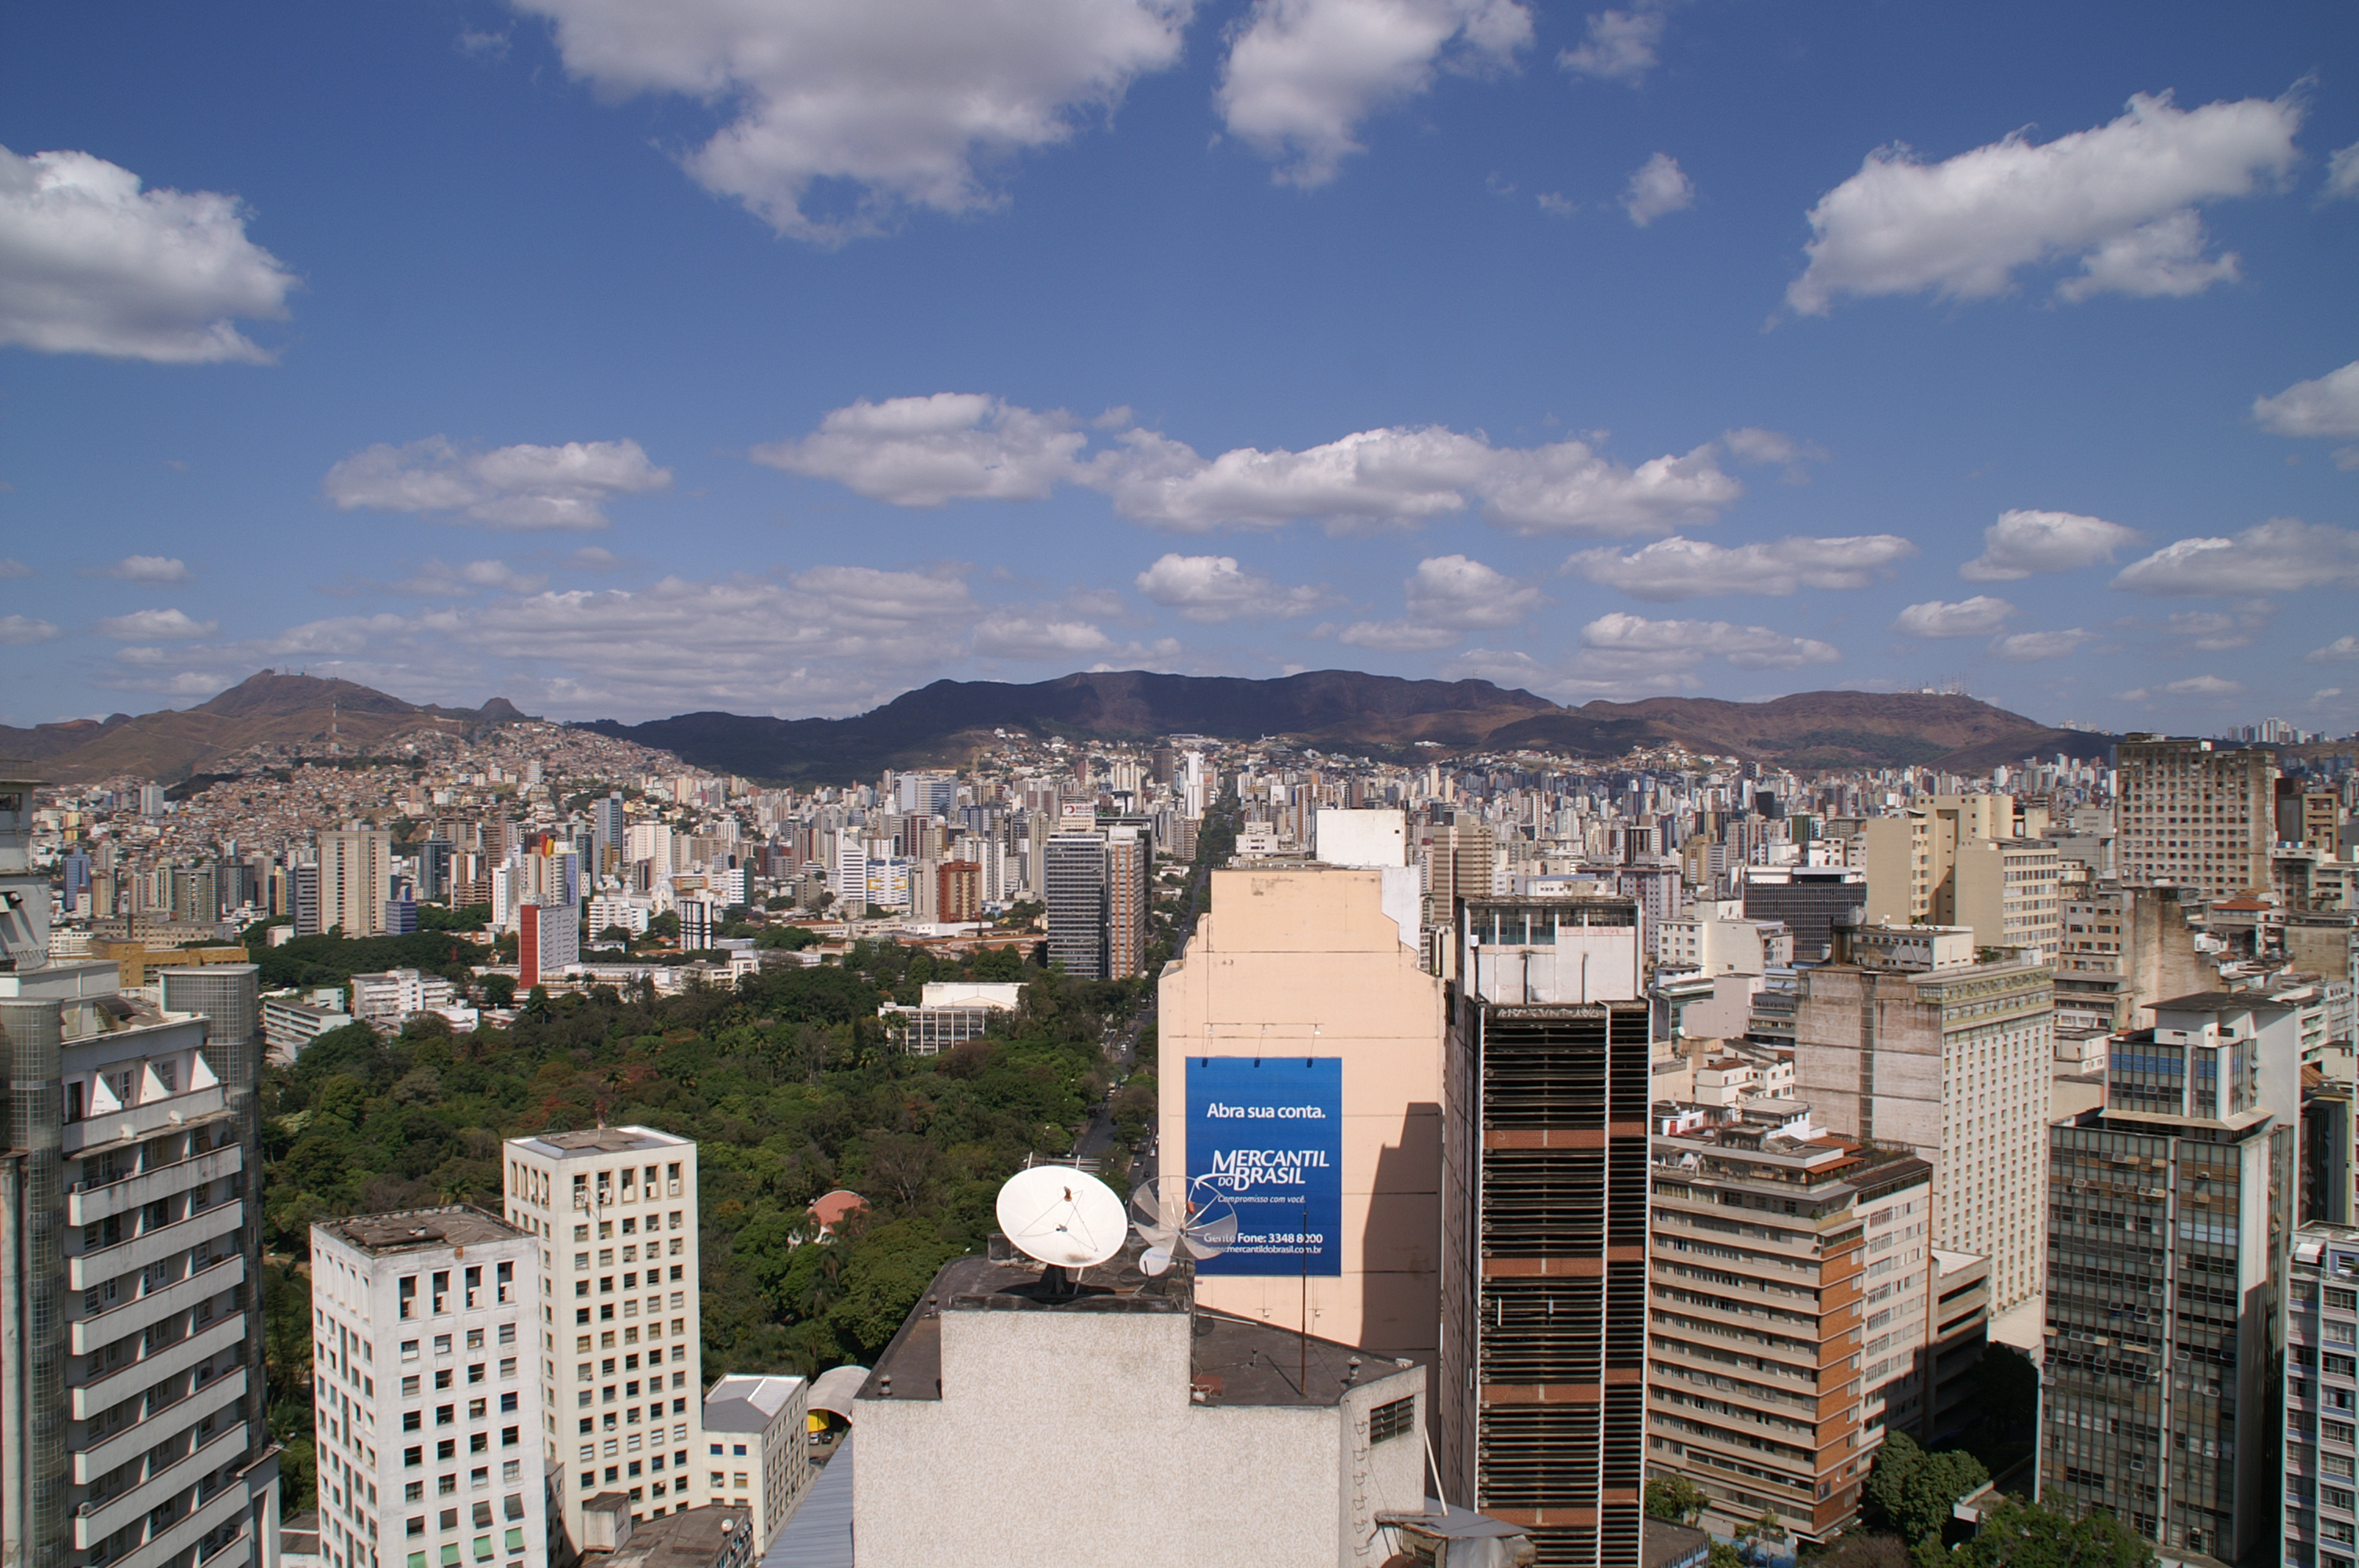 Belo Horizonte Brazil  city photos gallery : Description Belo Horizonte, Brazil building